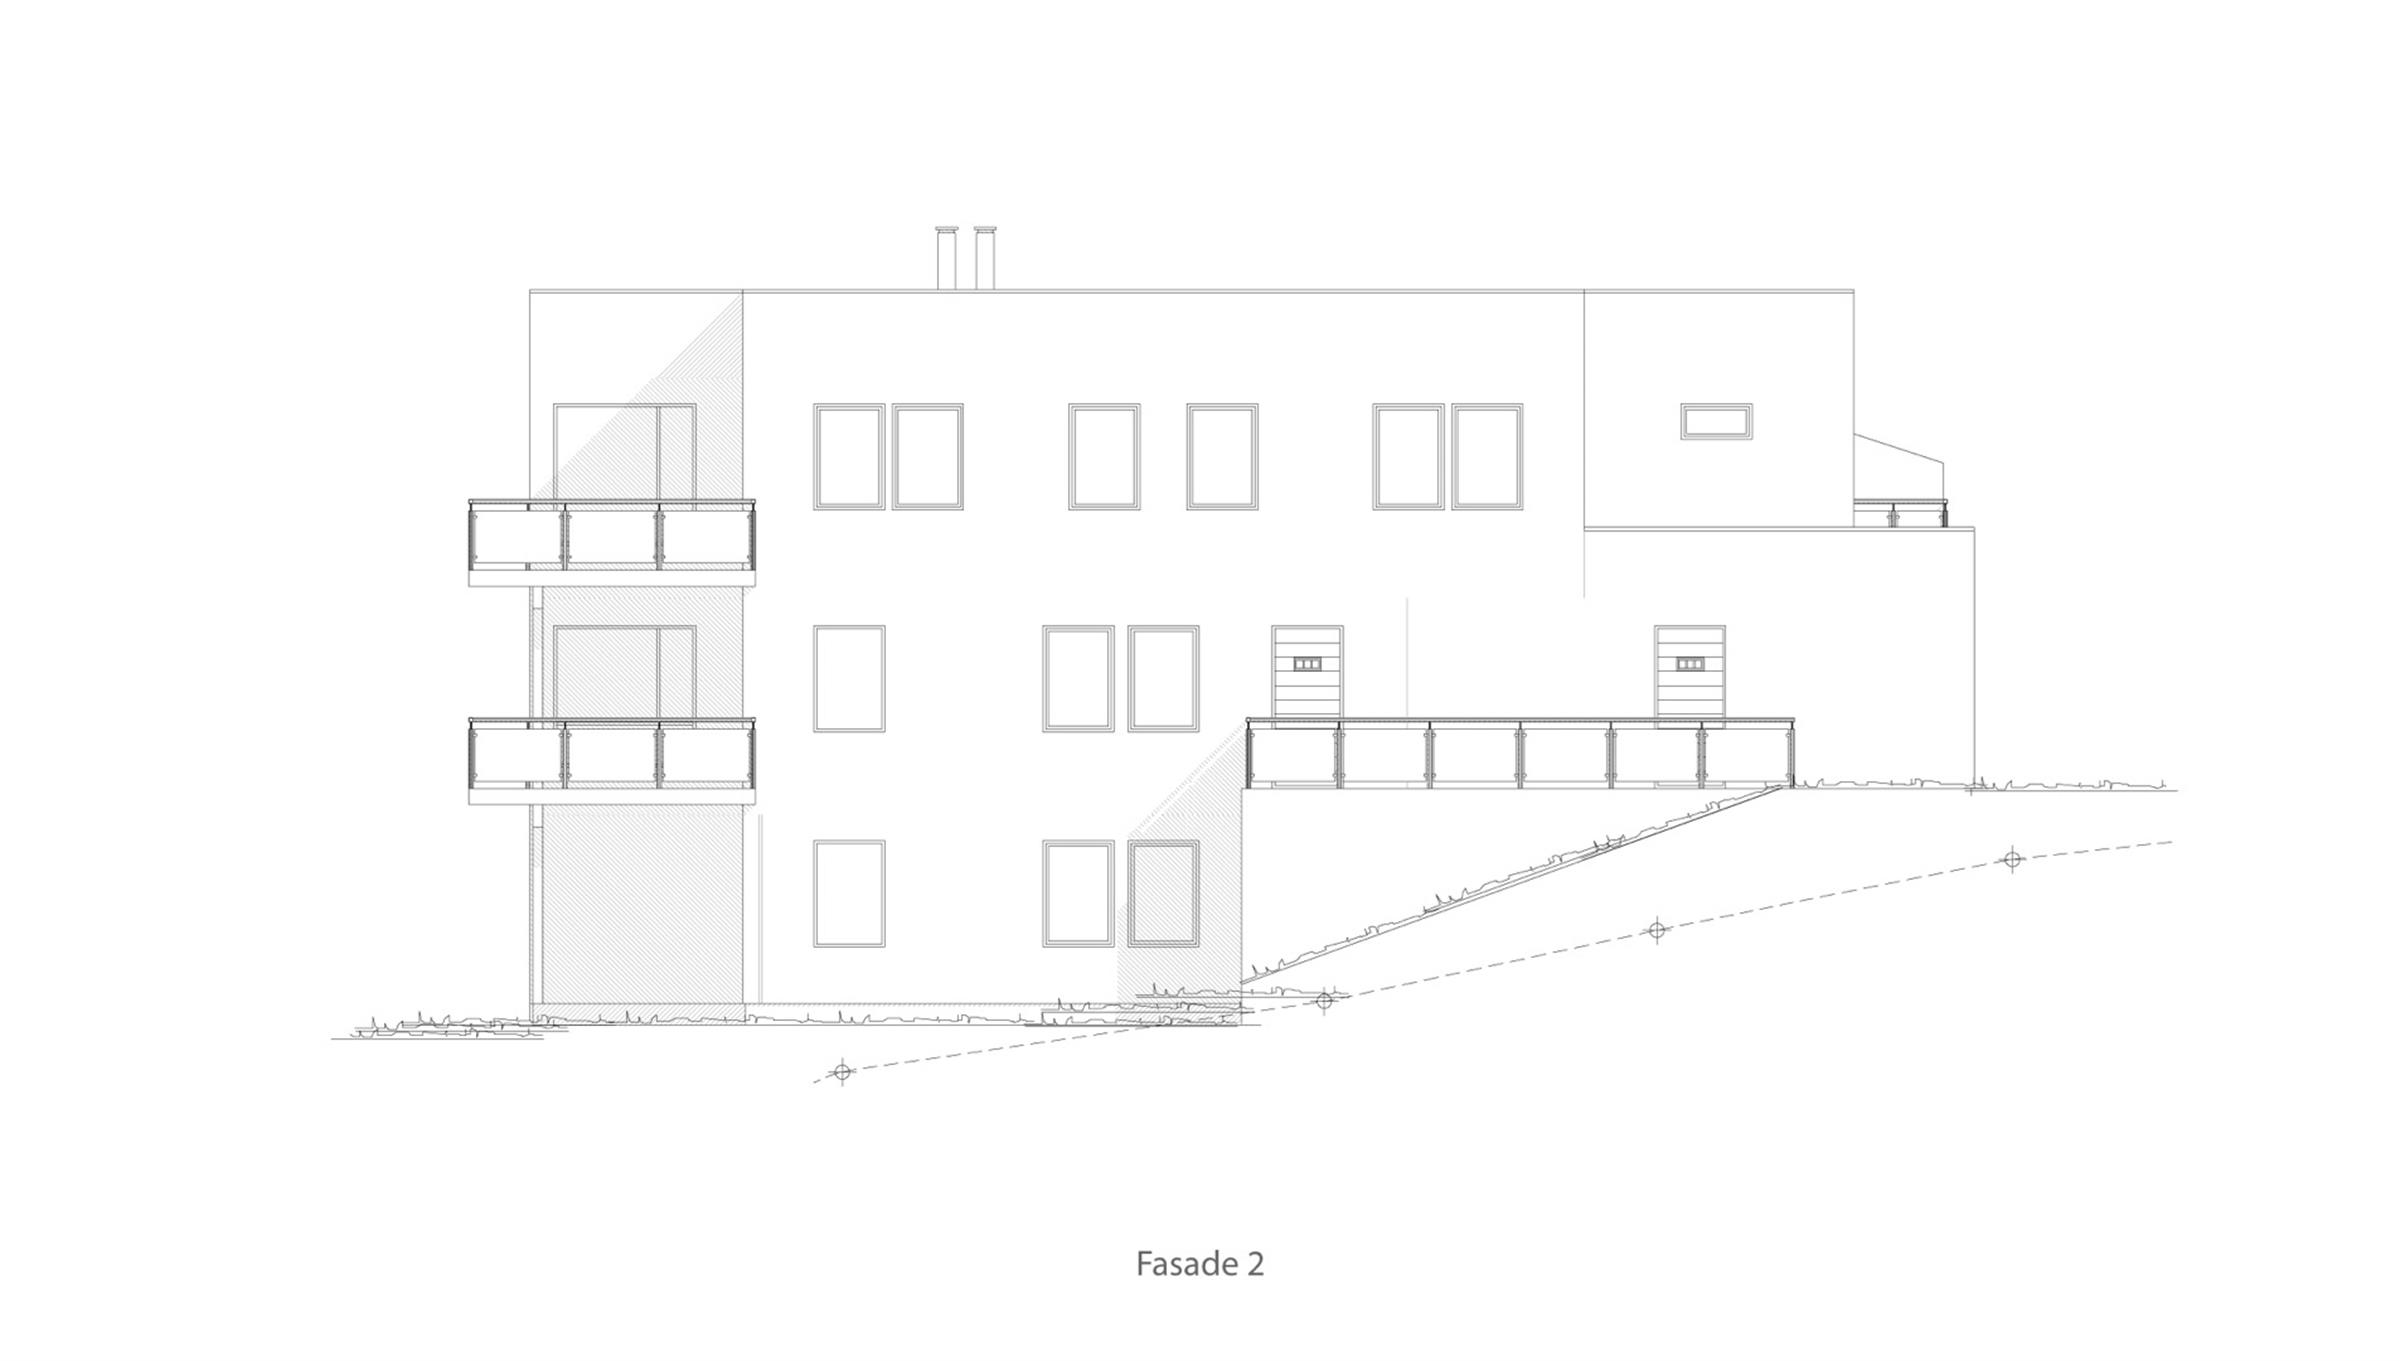 Drammen fasade 2